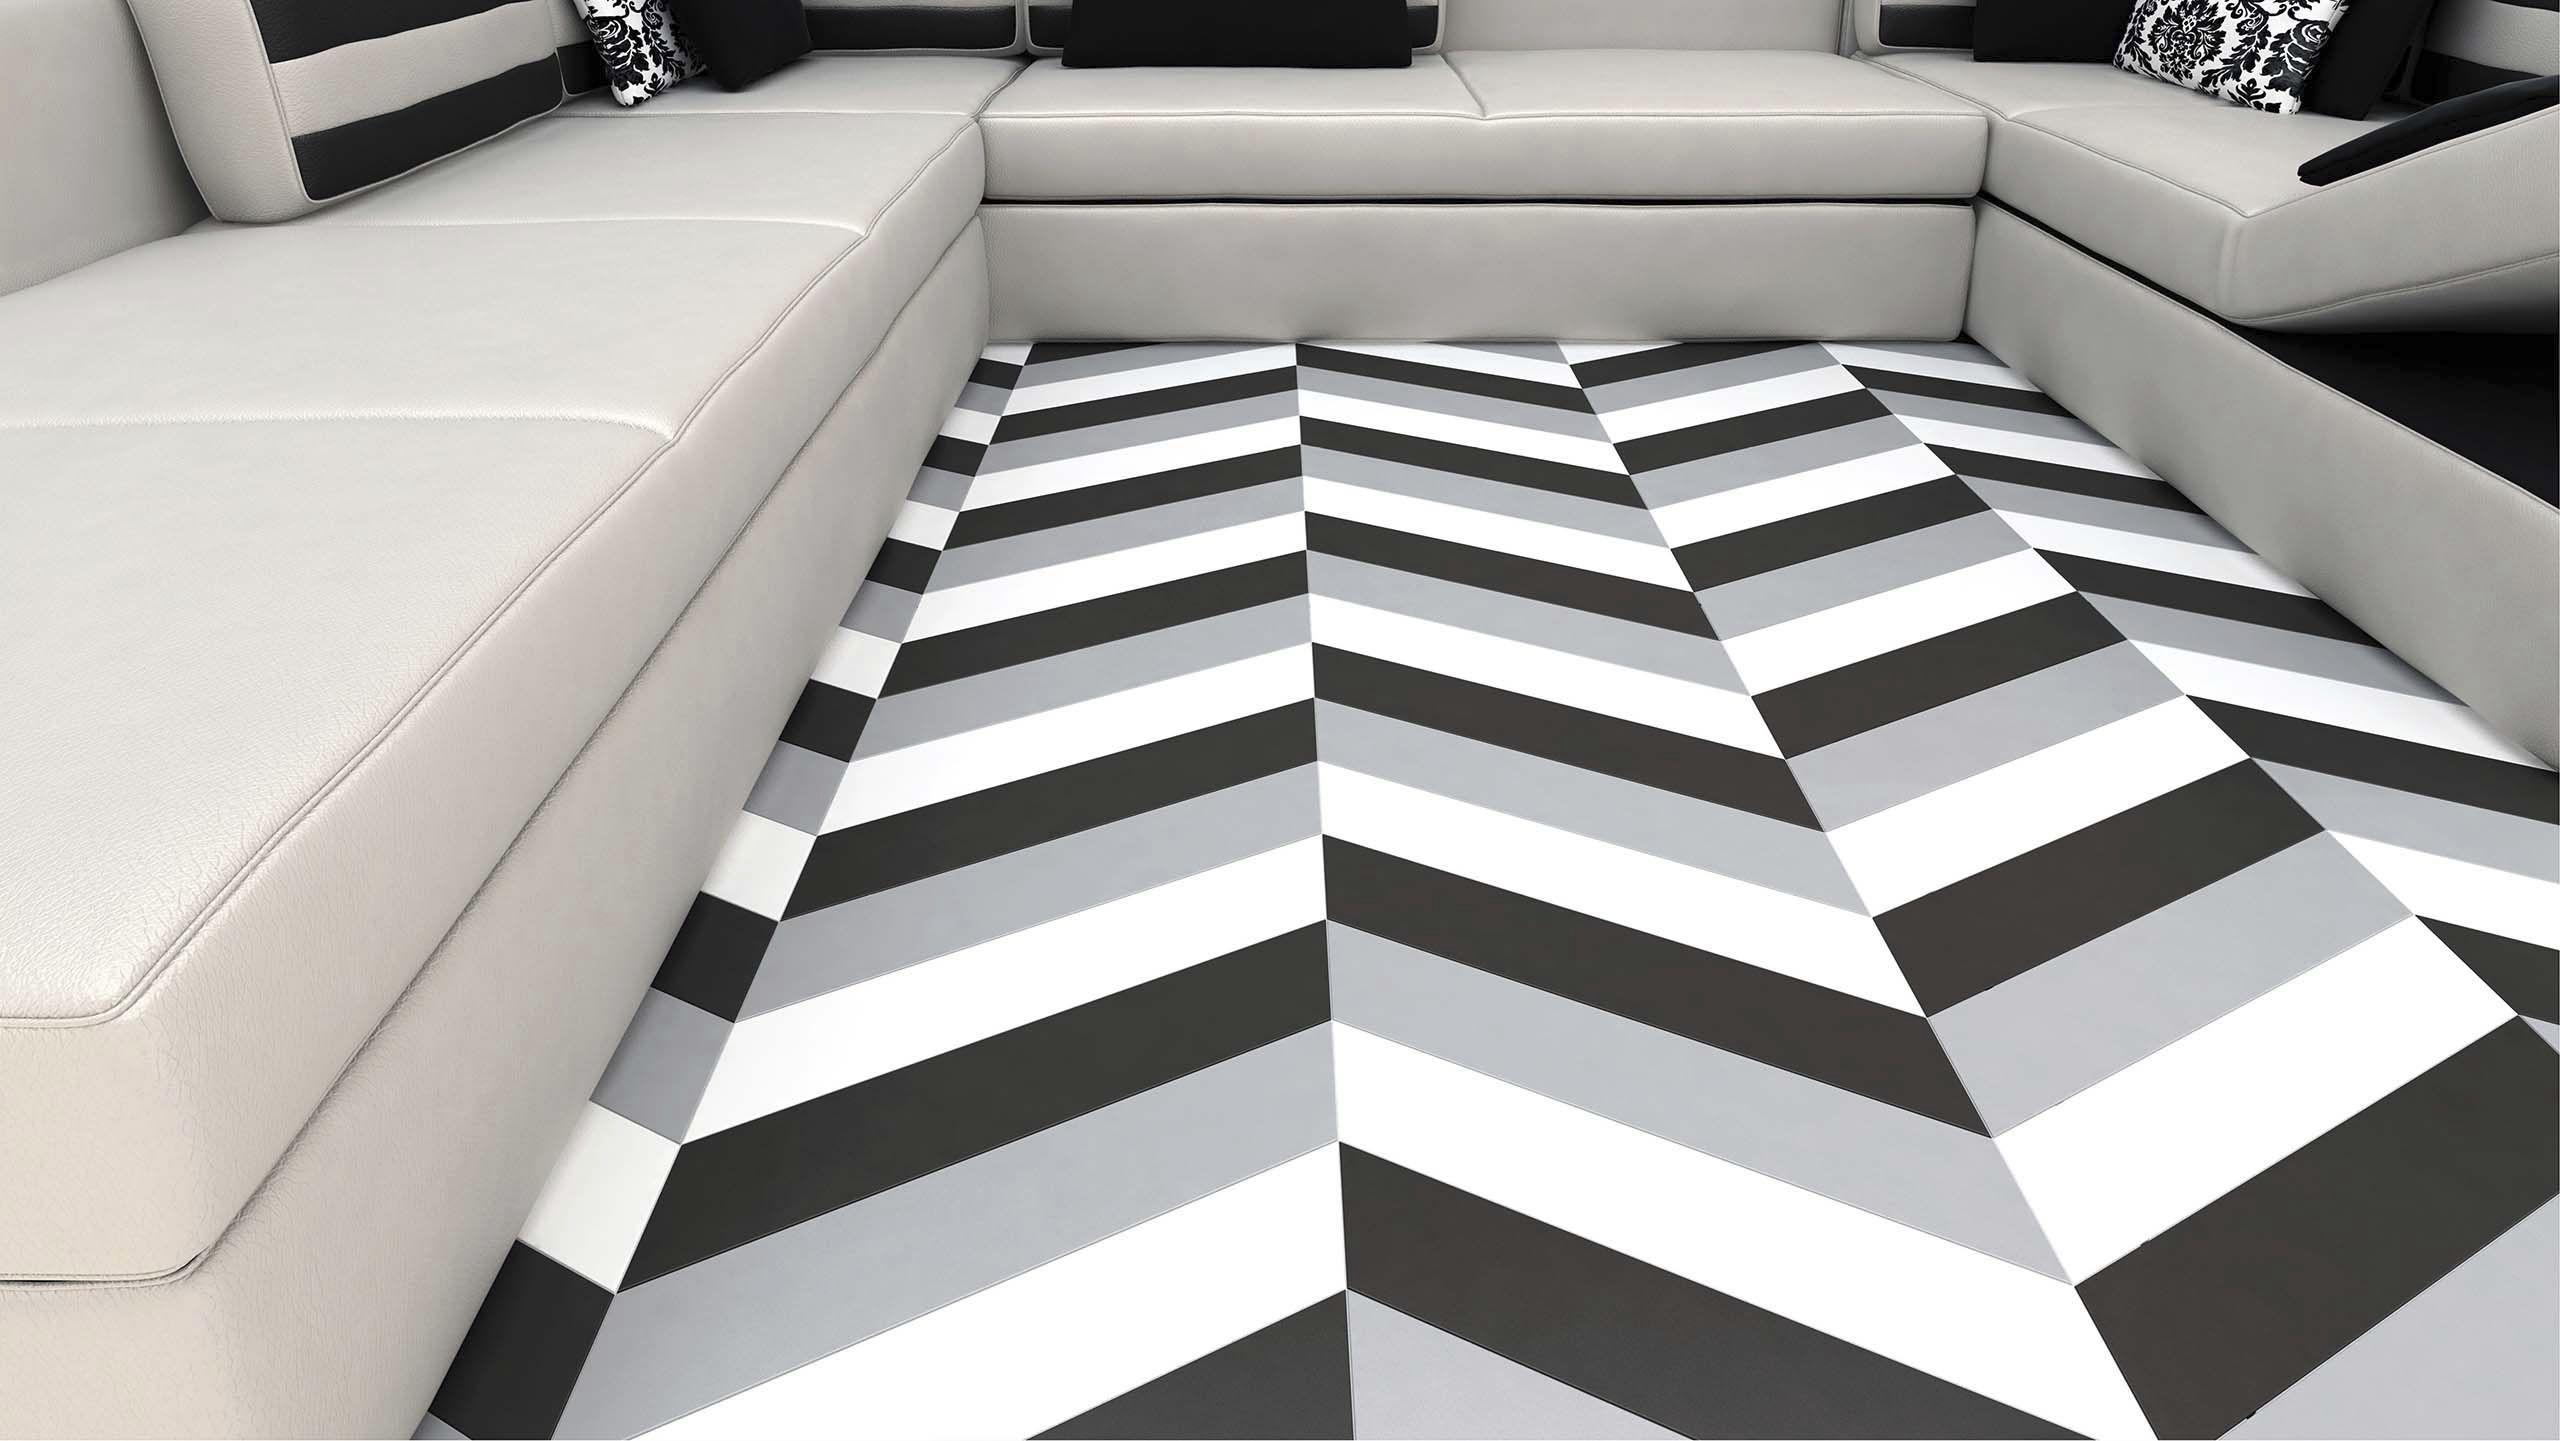 Indoor tile floor porcelain stoneware plain chevron floor indoor tile floor porcelain stoneware plain chevron floor wow design eu dailygadgetfo Choice Image